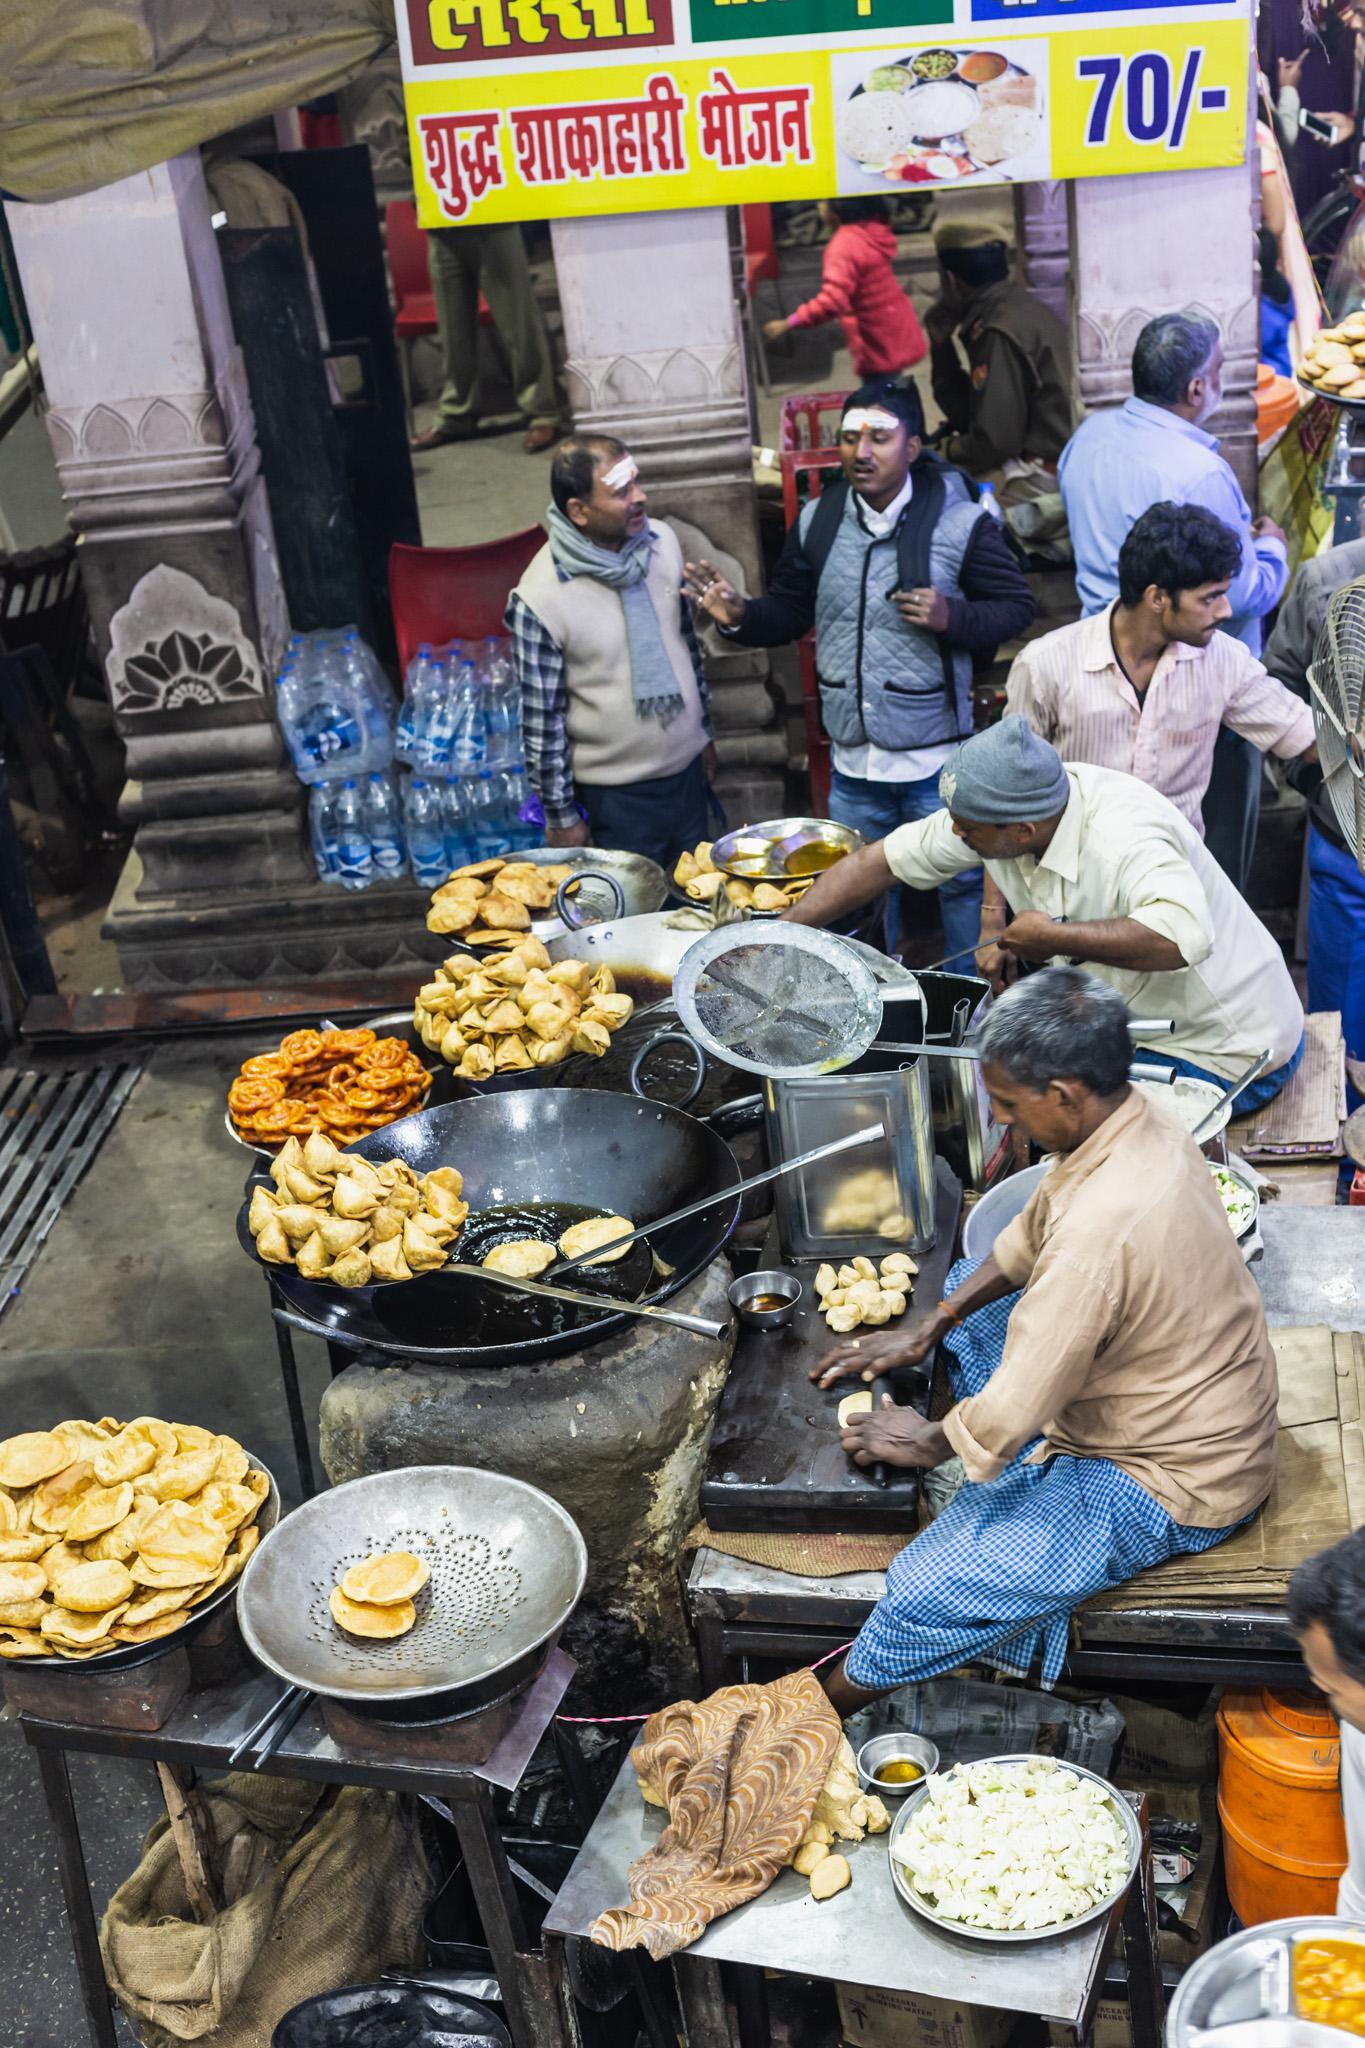 Street food stall in Varanasi, India.